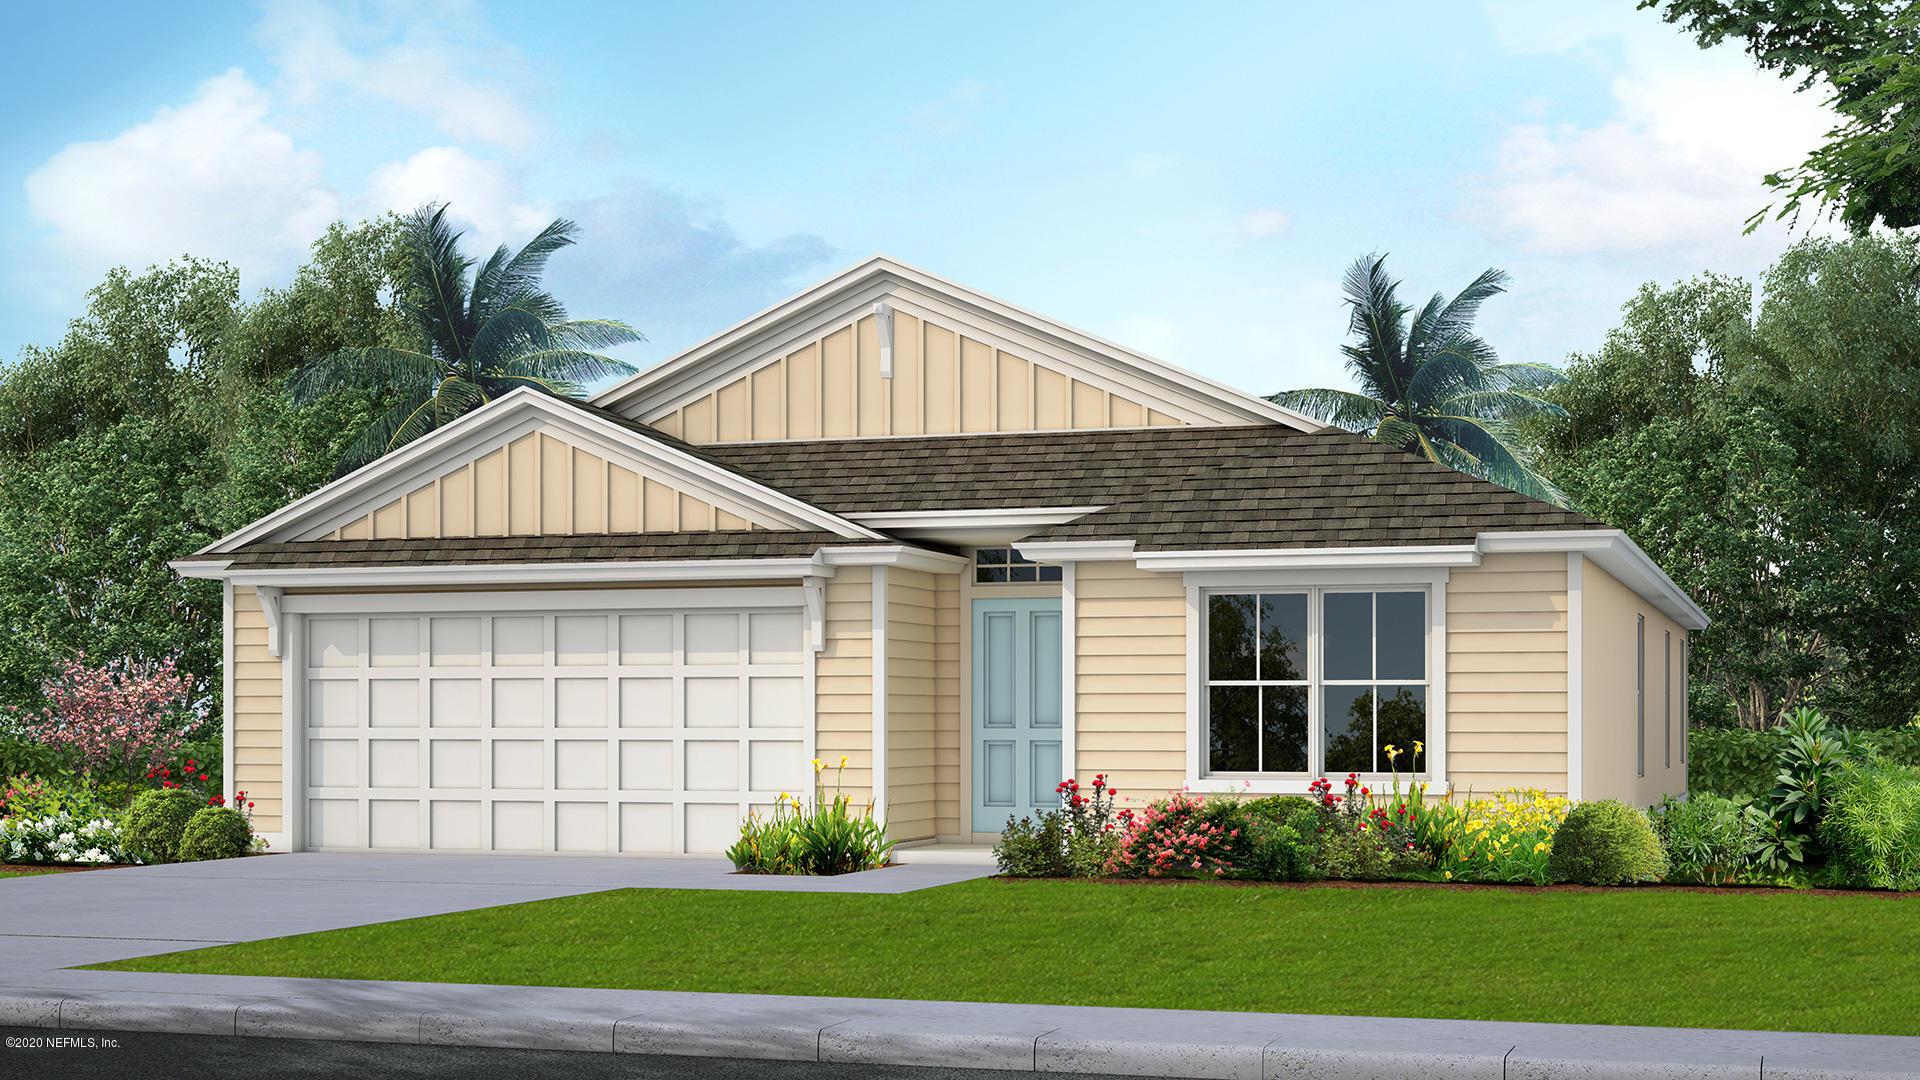 83271 YULEECOTE, FERNANDINA BEACH, FLORIDA 32034, 4 Bedrooms Bedrooms, ,2 BathroomsBathrooms,Residential,For sale,YULEECOTE,1051075